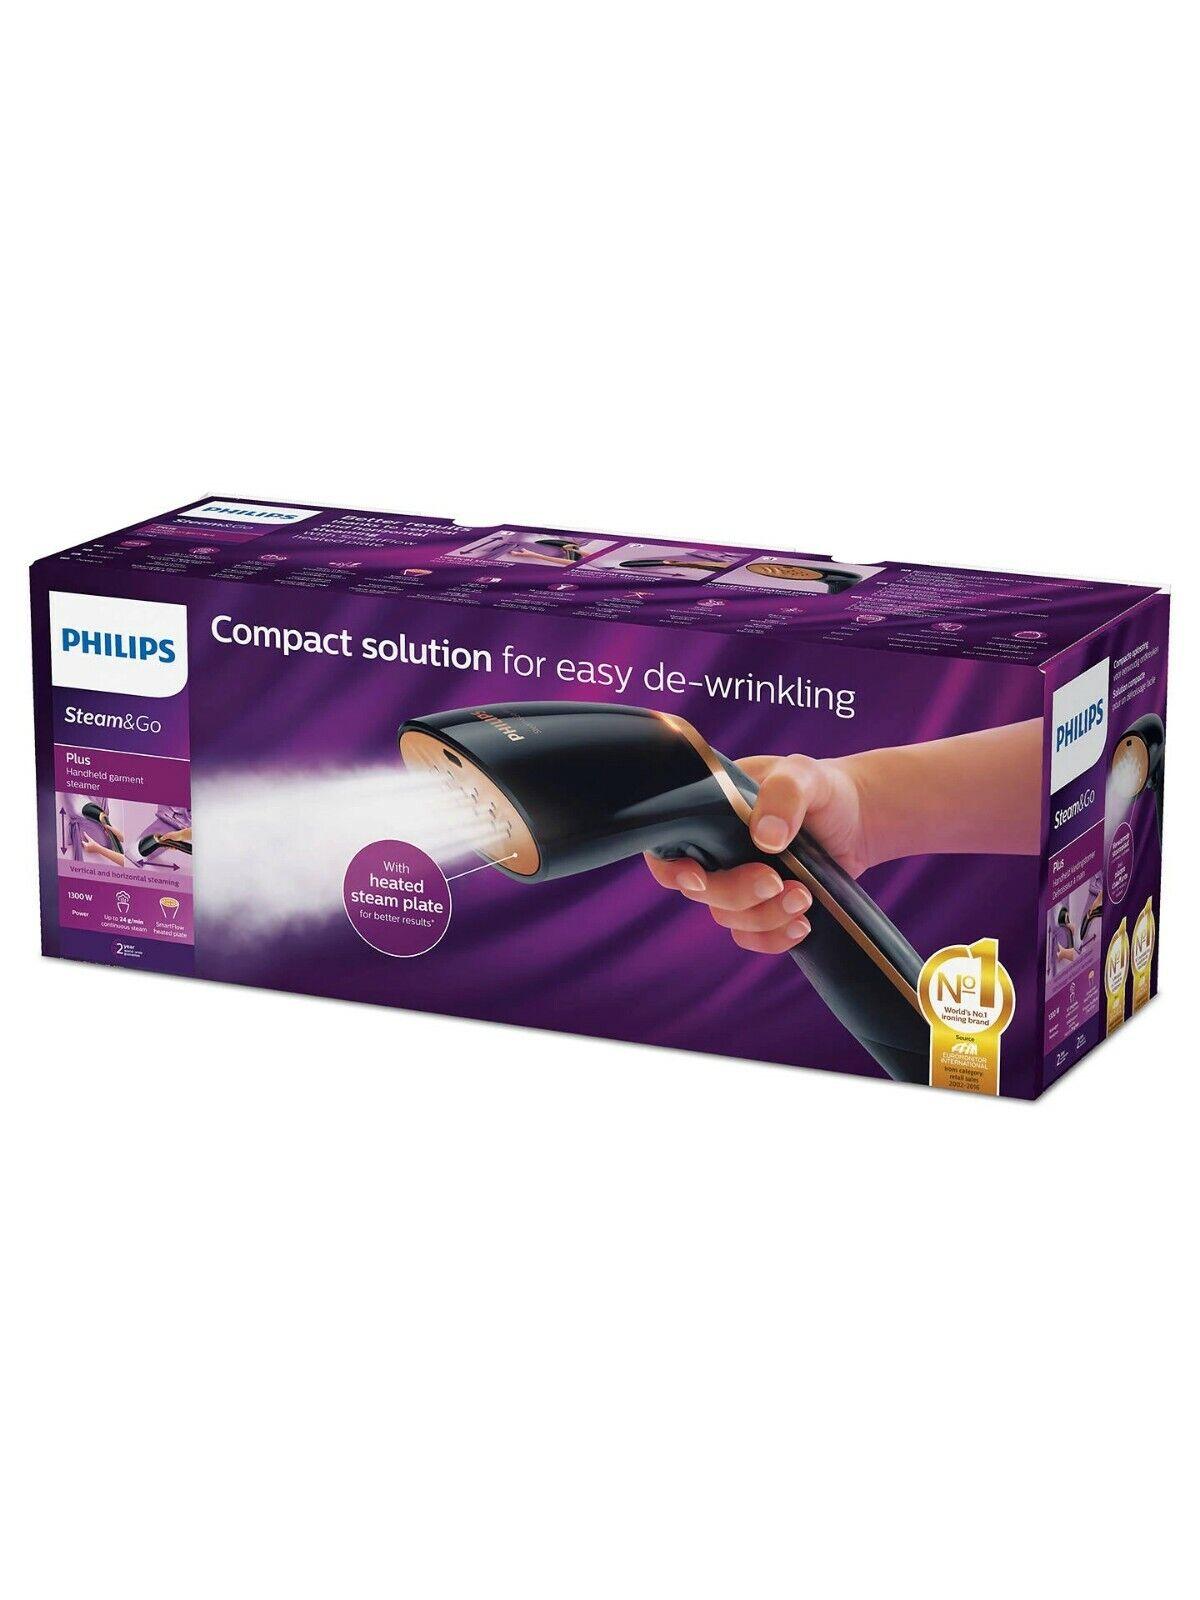 PHILIPS Steam & Go Plus GC362/86 Handheld Garment Steamer -